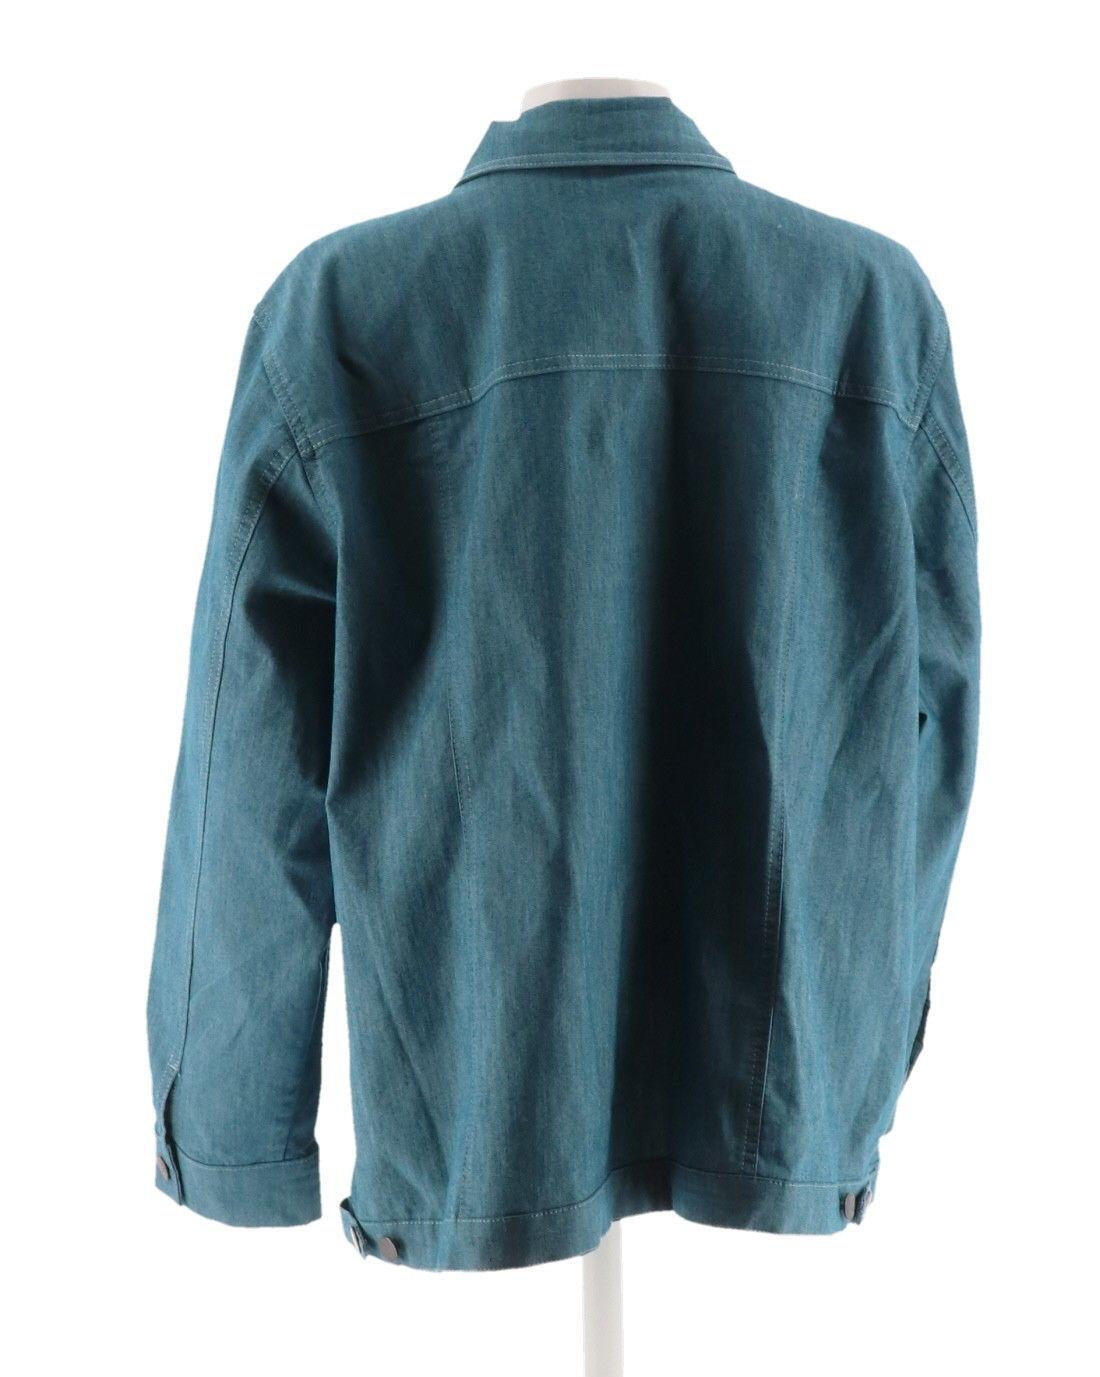 Denim & Co Stretch Colored Long Slv Jean Jacket Pockets Dark Teal L NEW A87003